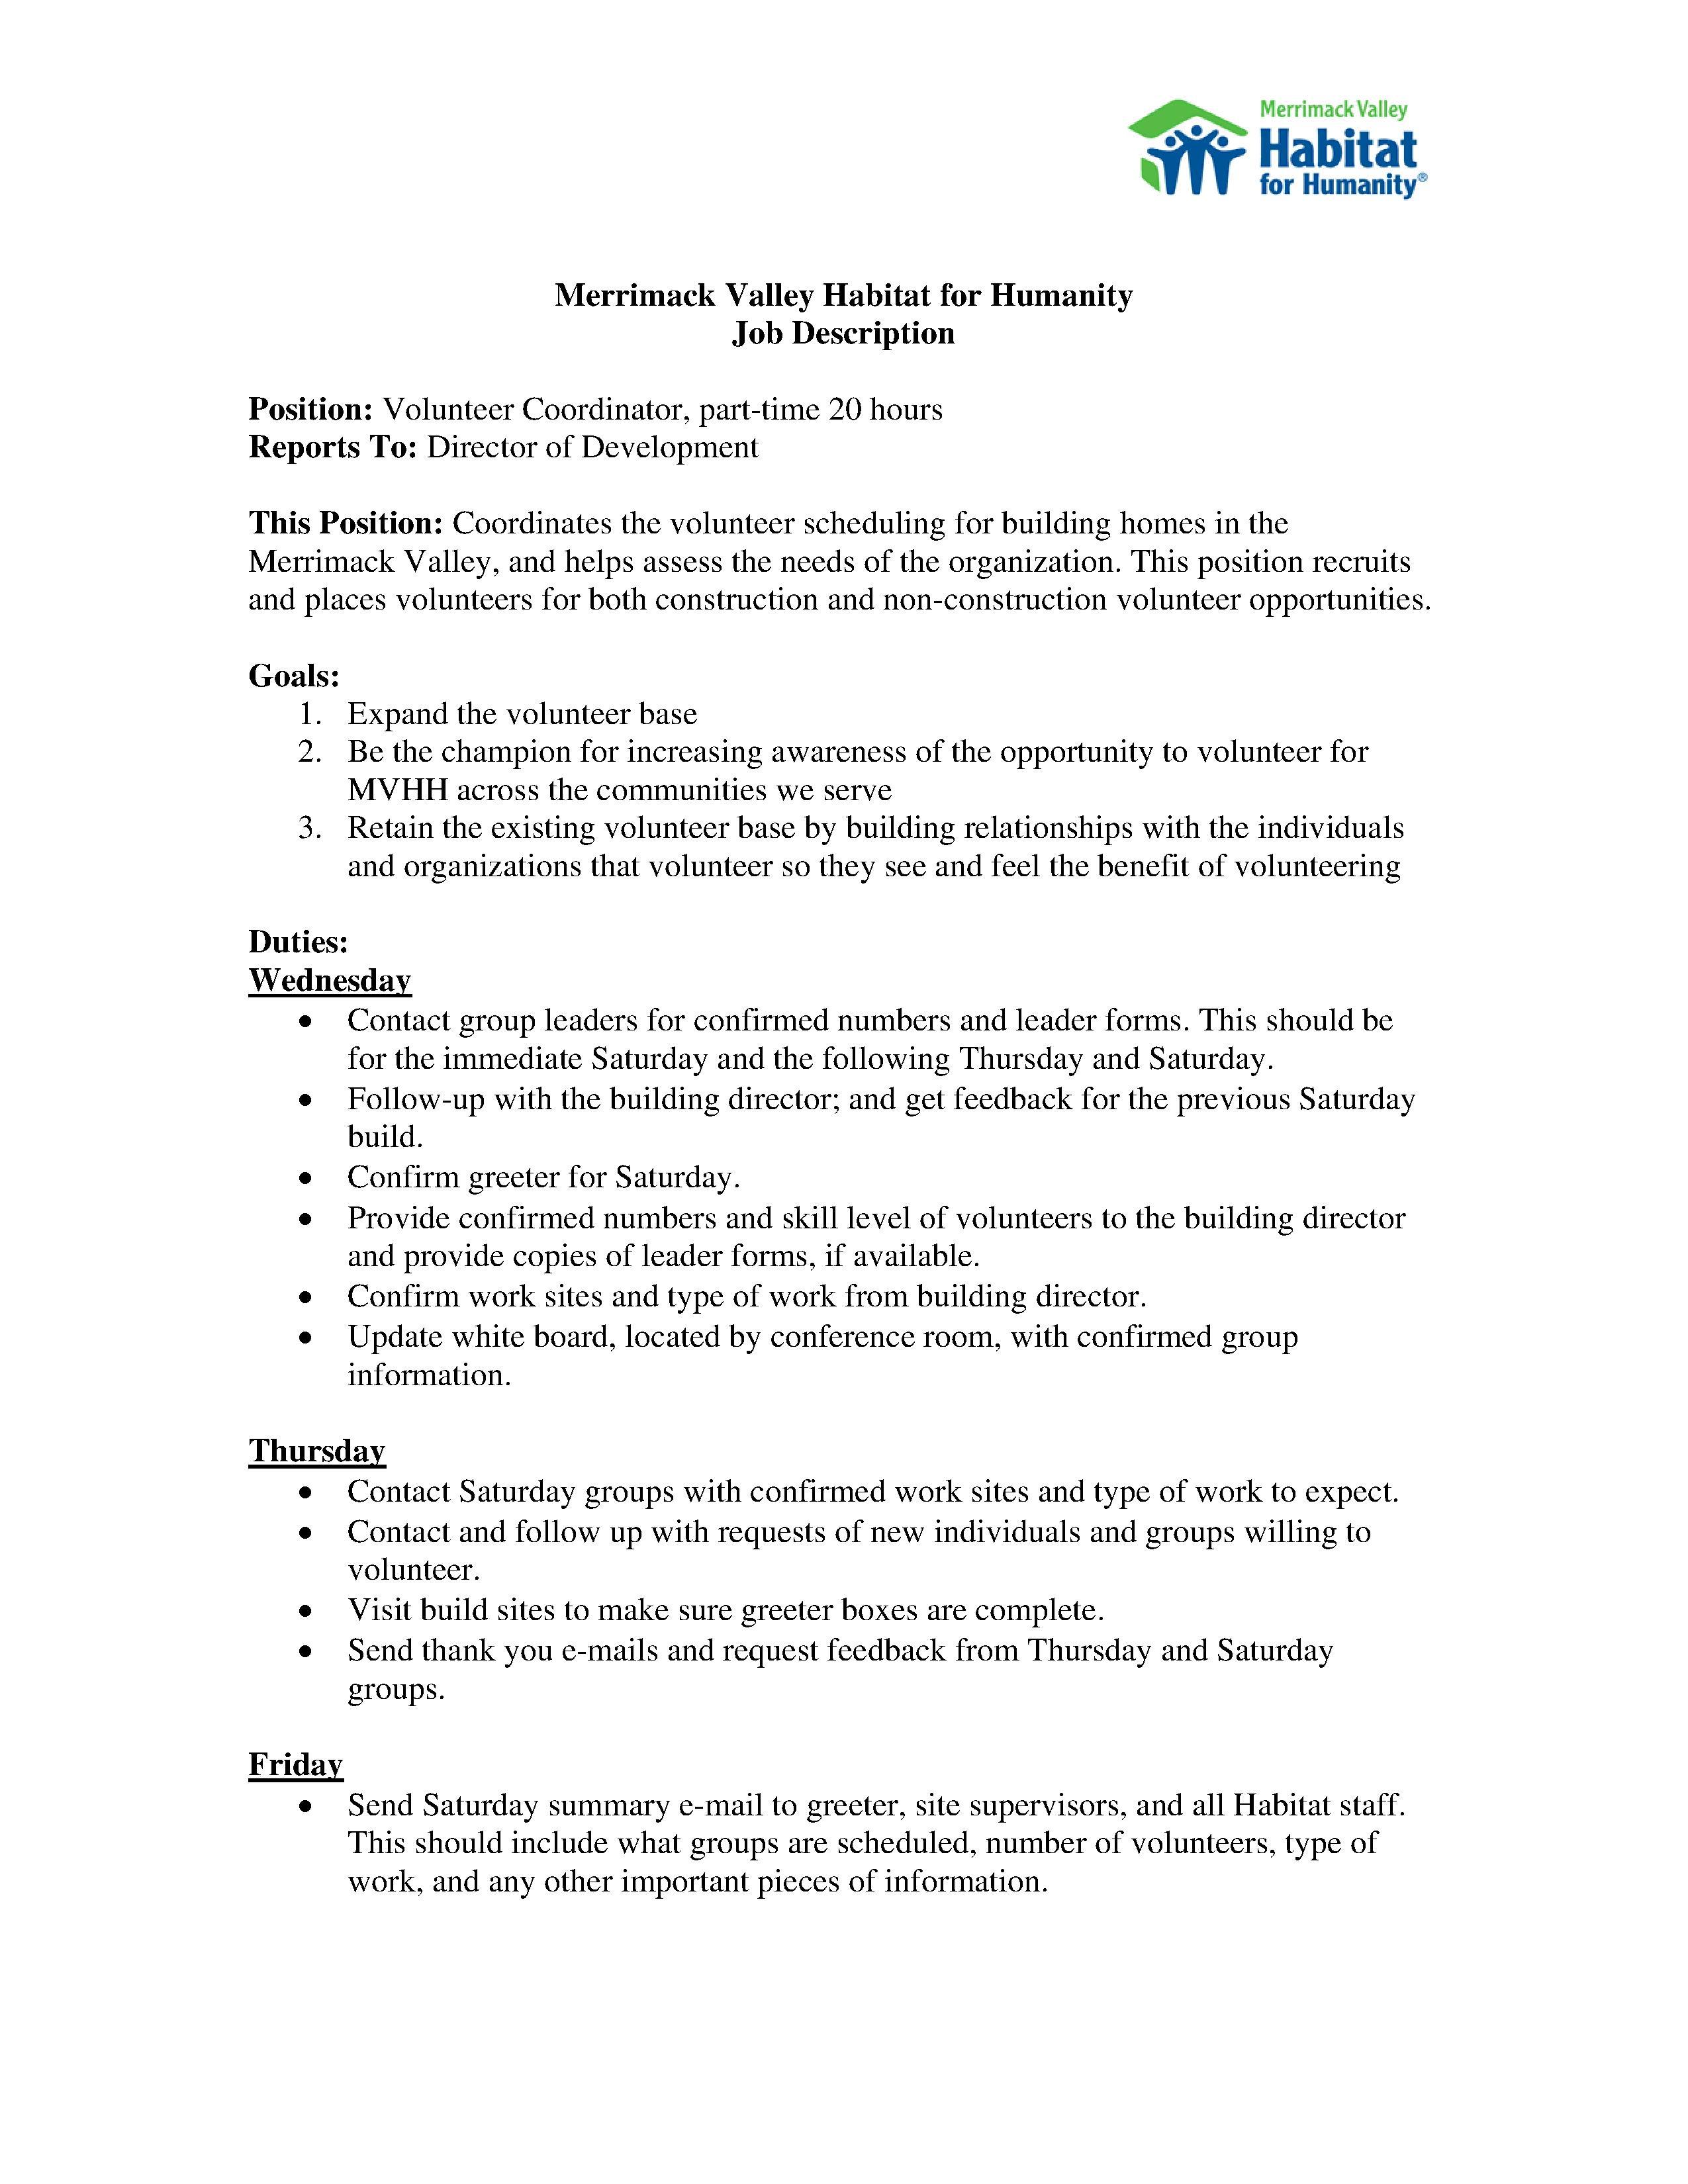 math tutor responsibilities resume sle resume format